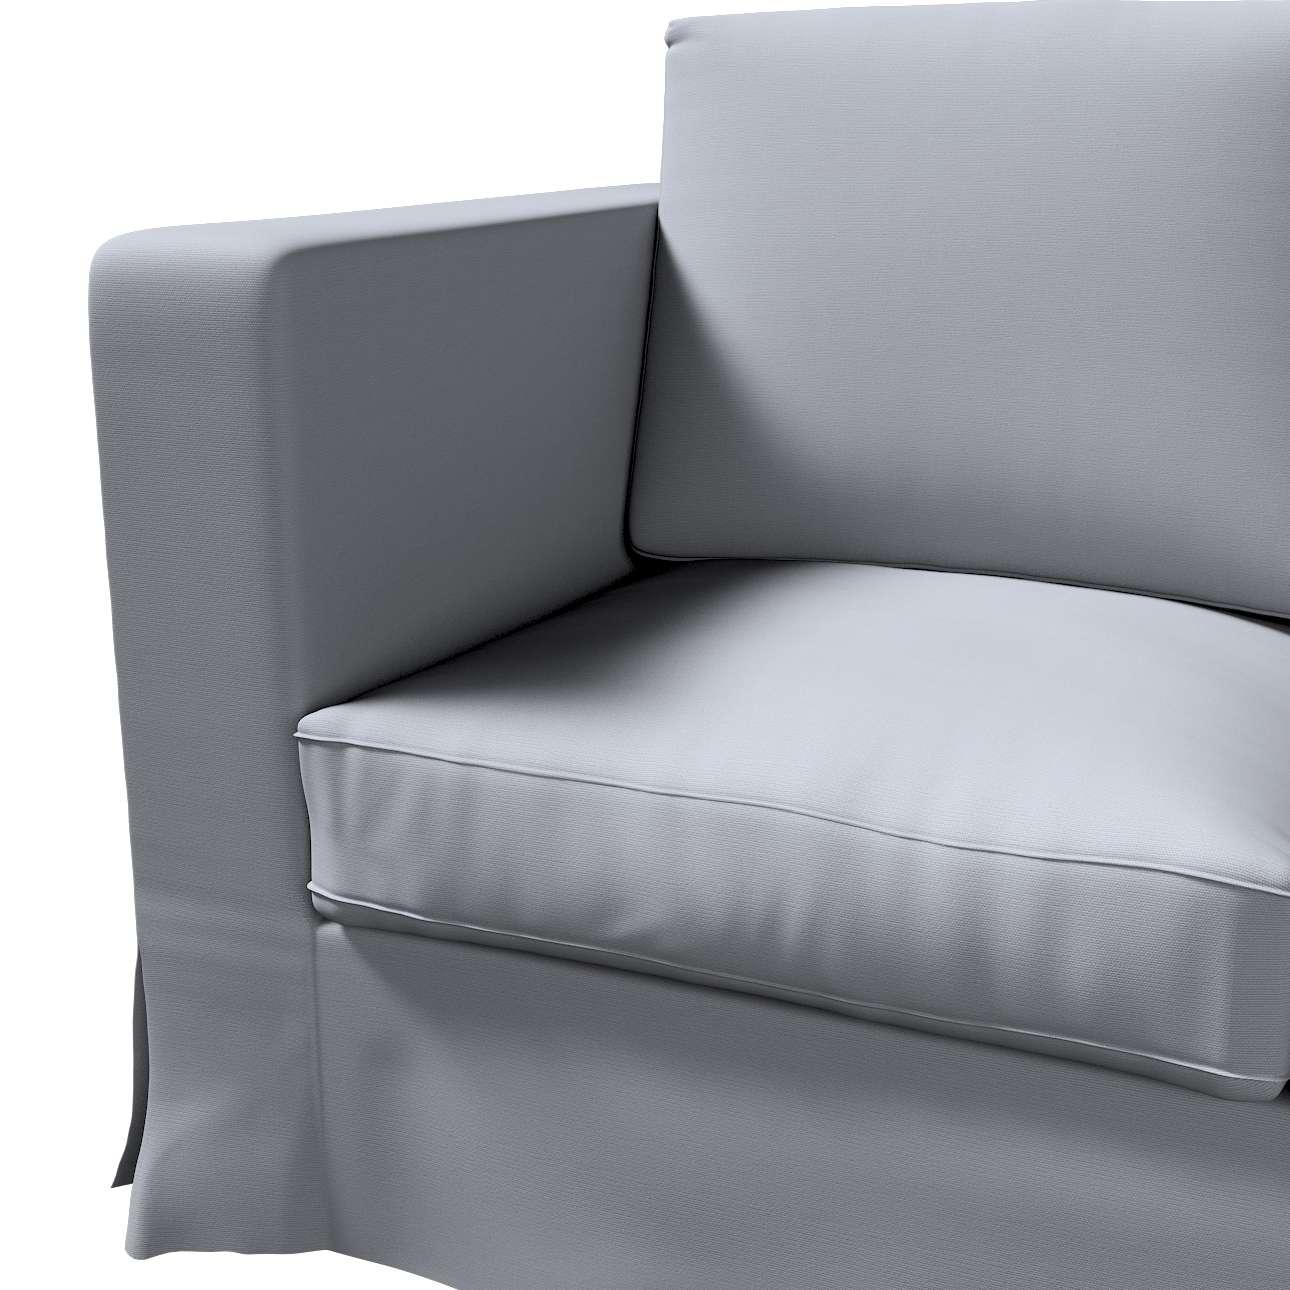 Karlanda klädsel 3-sits soffa - lång i kollektionen Panama Cotton, Tyg: 702-07